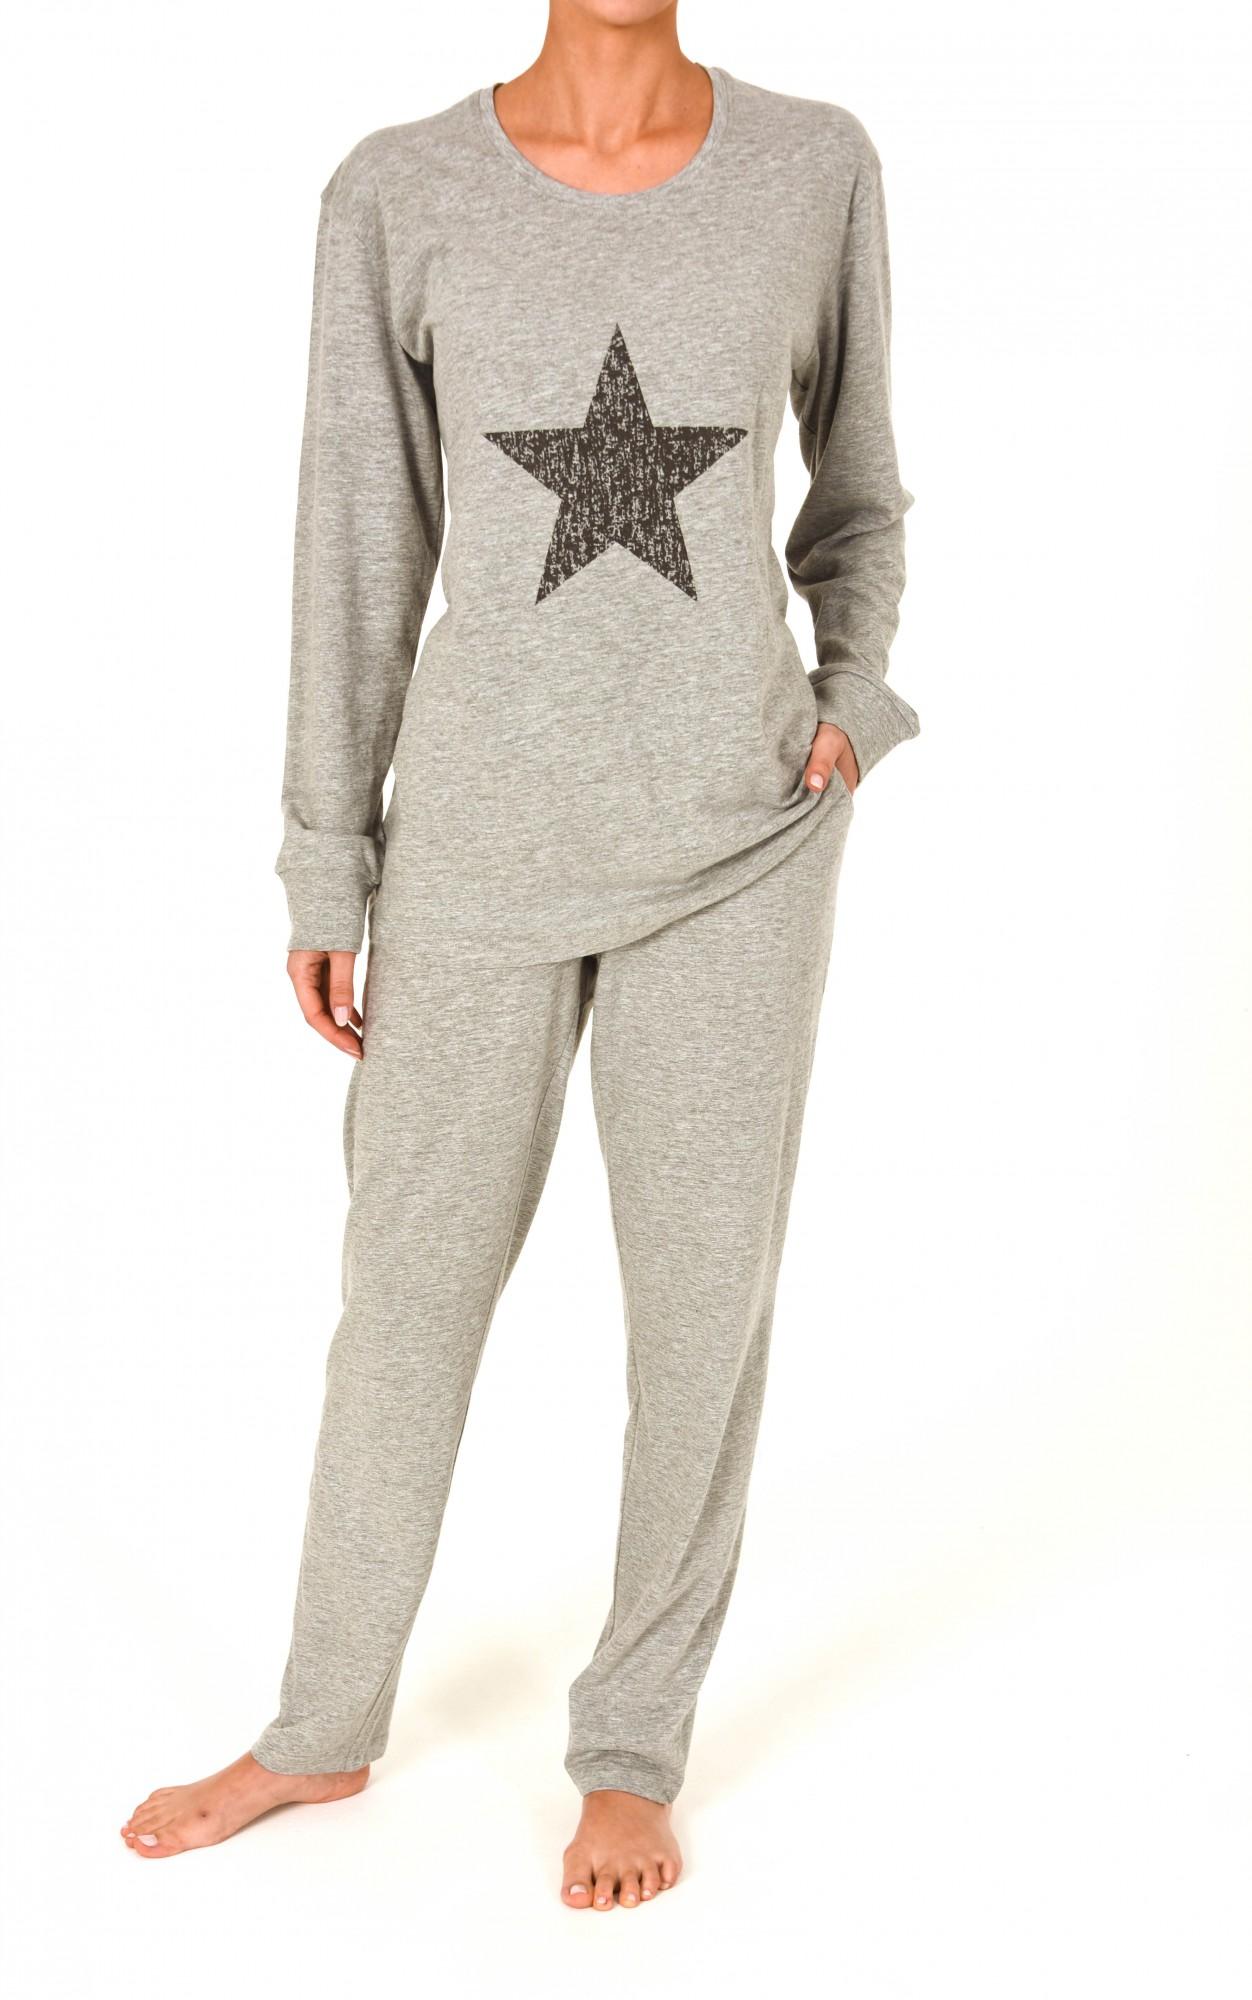 Pyjama langarm, auch als Loungewear, Homewear oder Hausanzug, 251 201 90 590 001